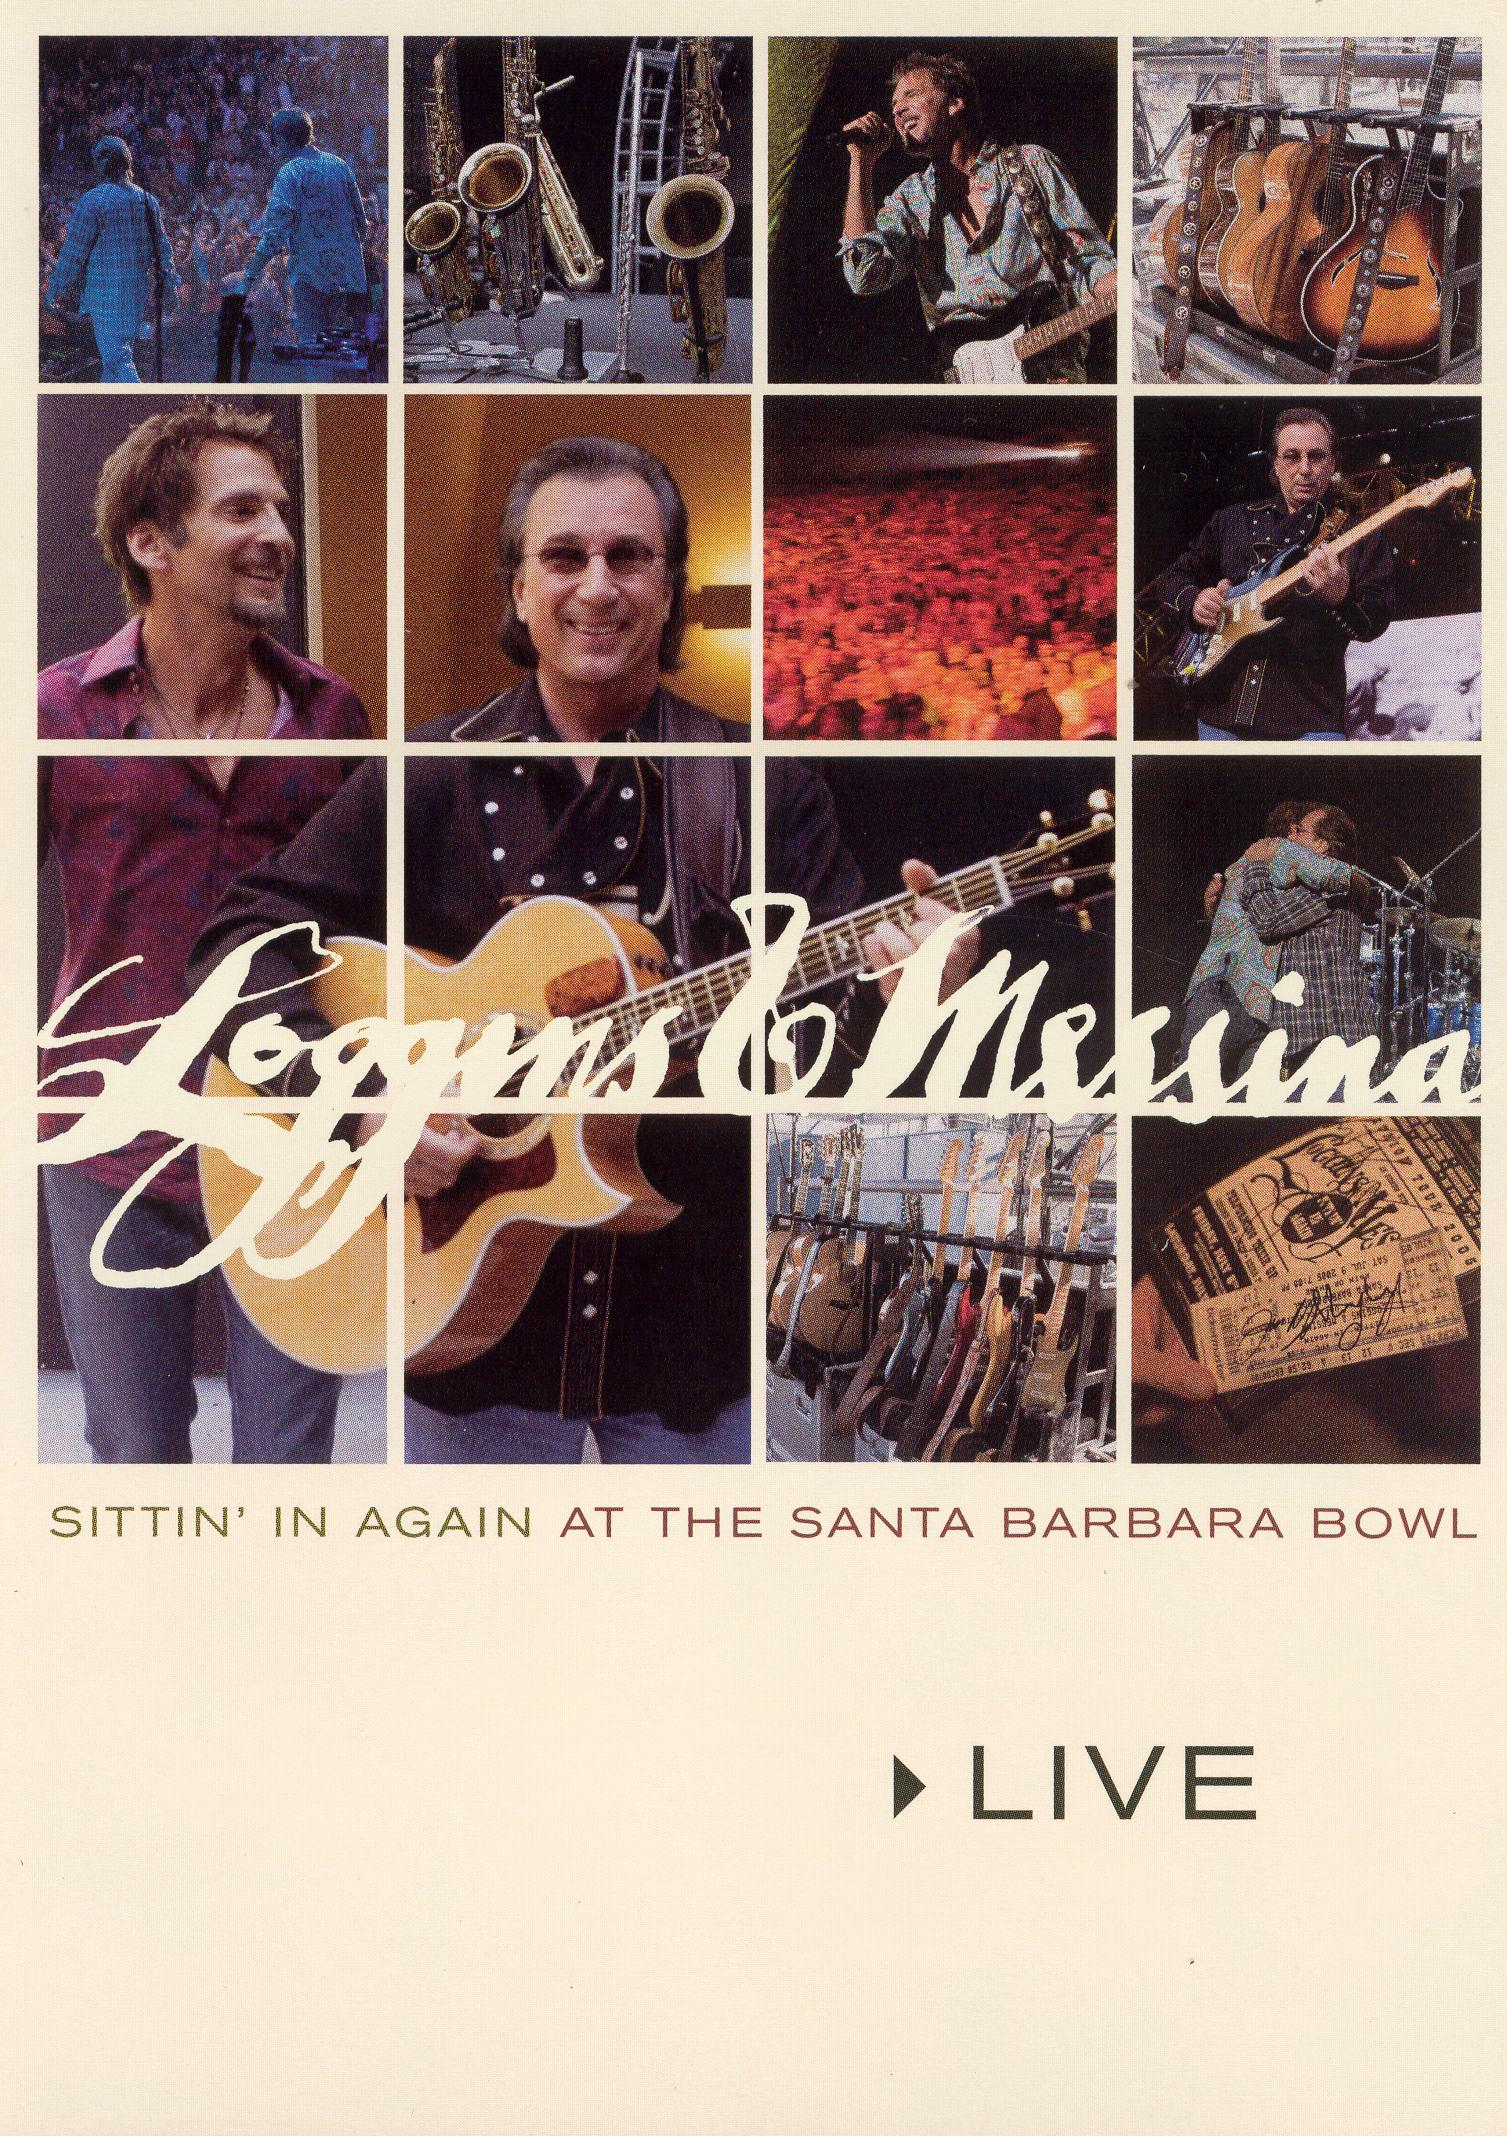 Loggins and Messina: Live: Sittin in Again at Santa Barbara Bowl